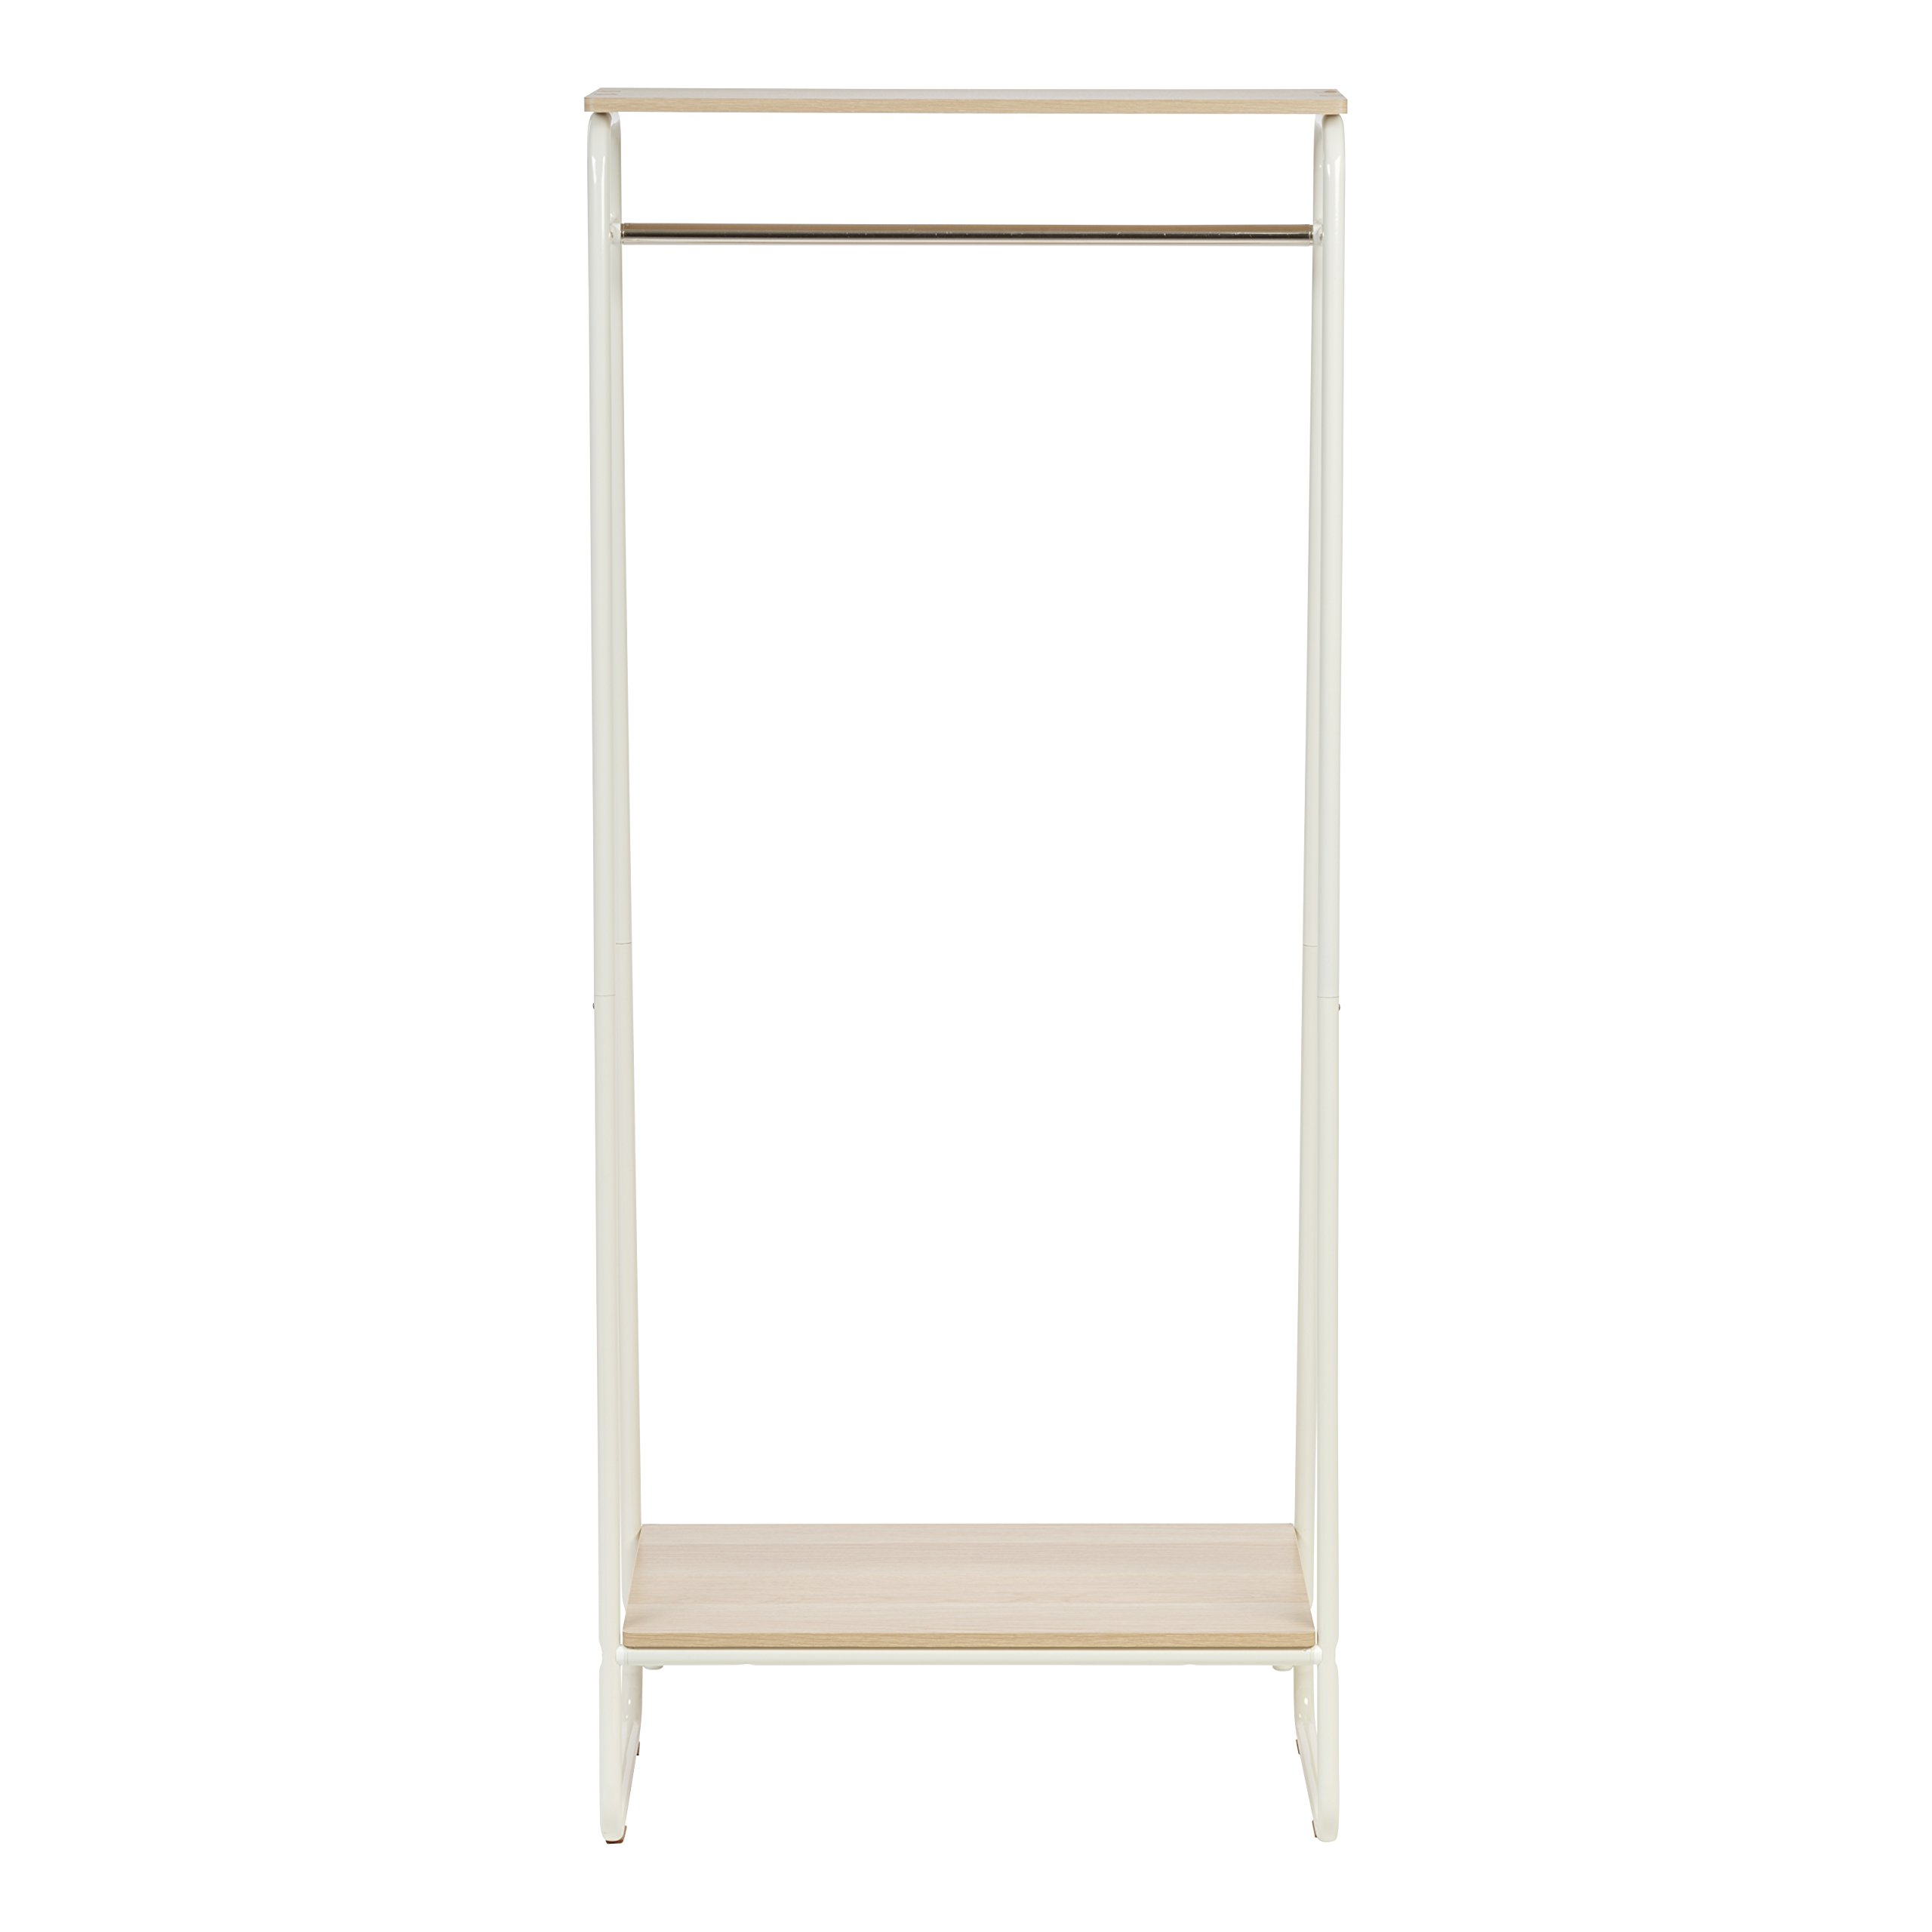 IRIS Metal Garment Rack with 2 Wood Shelves, White and Light Brown by IRIS USA, Inc. (Image #3)